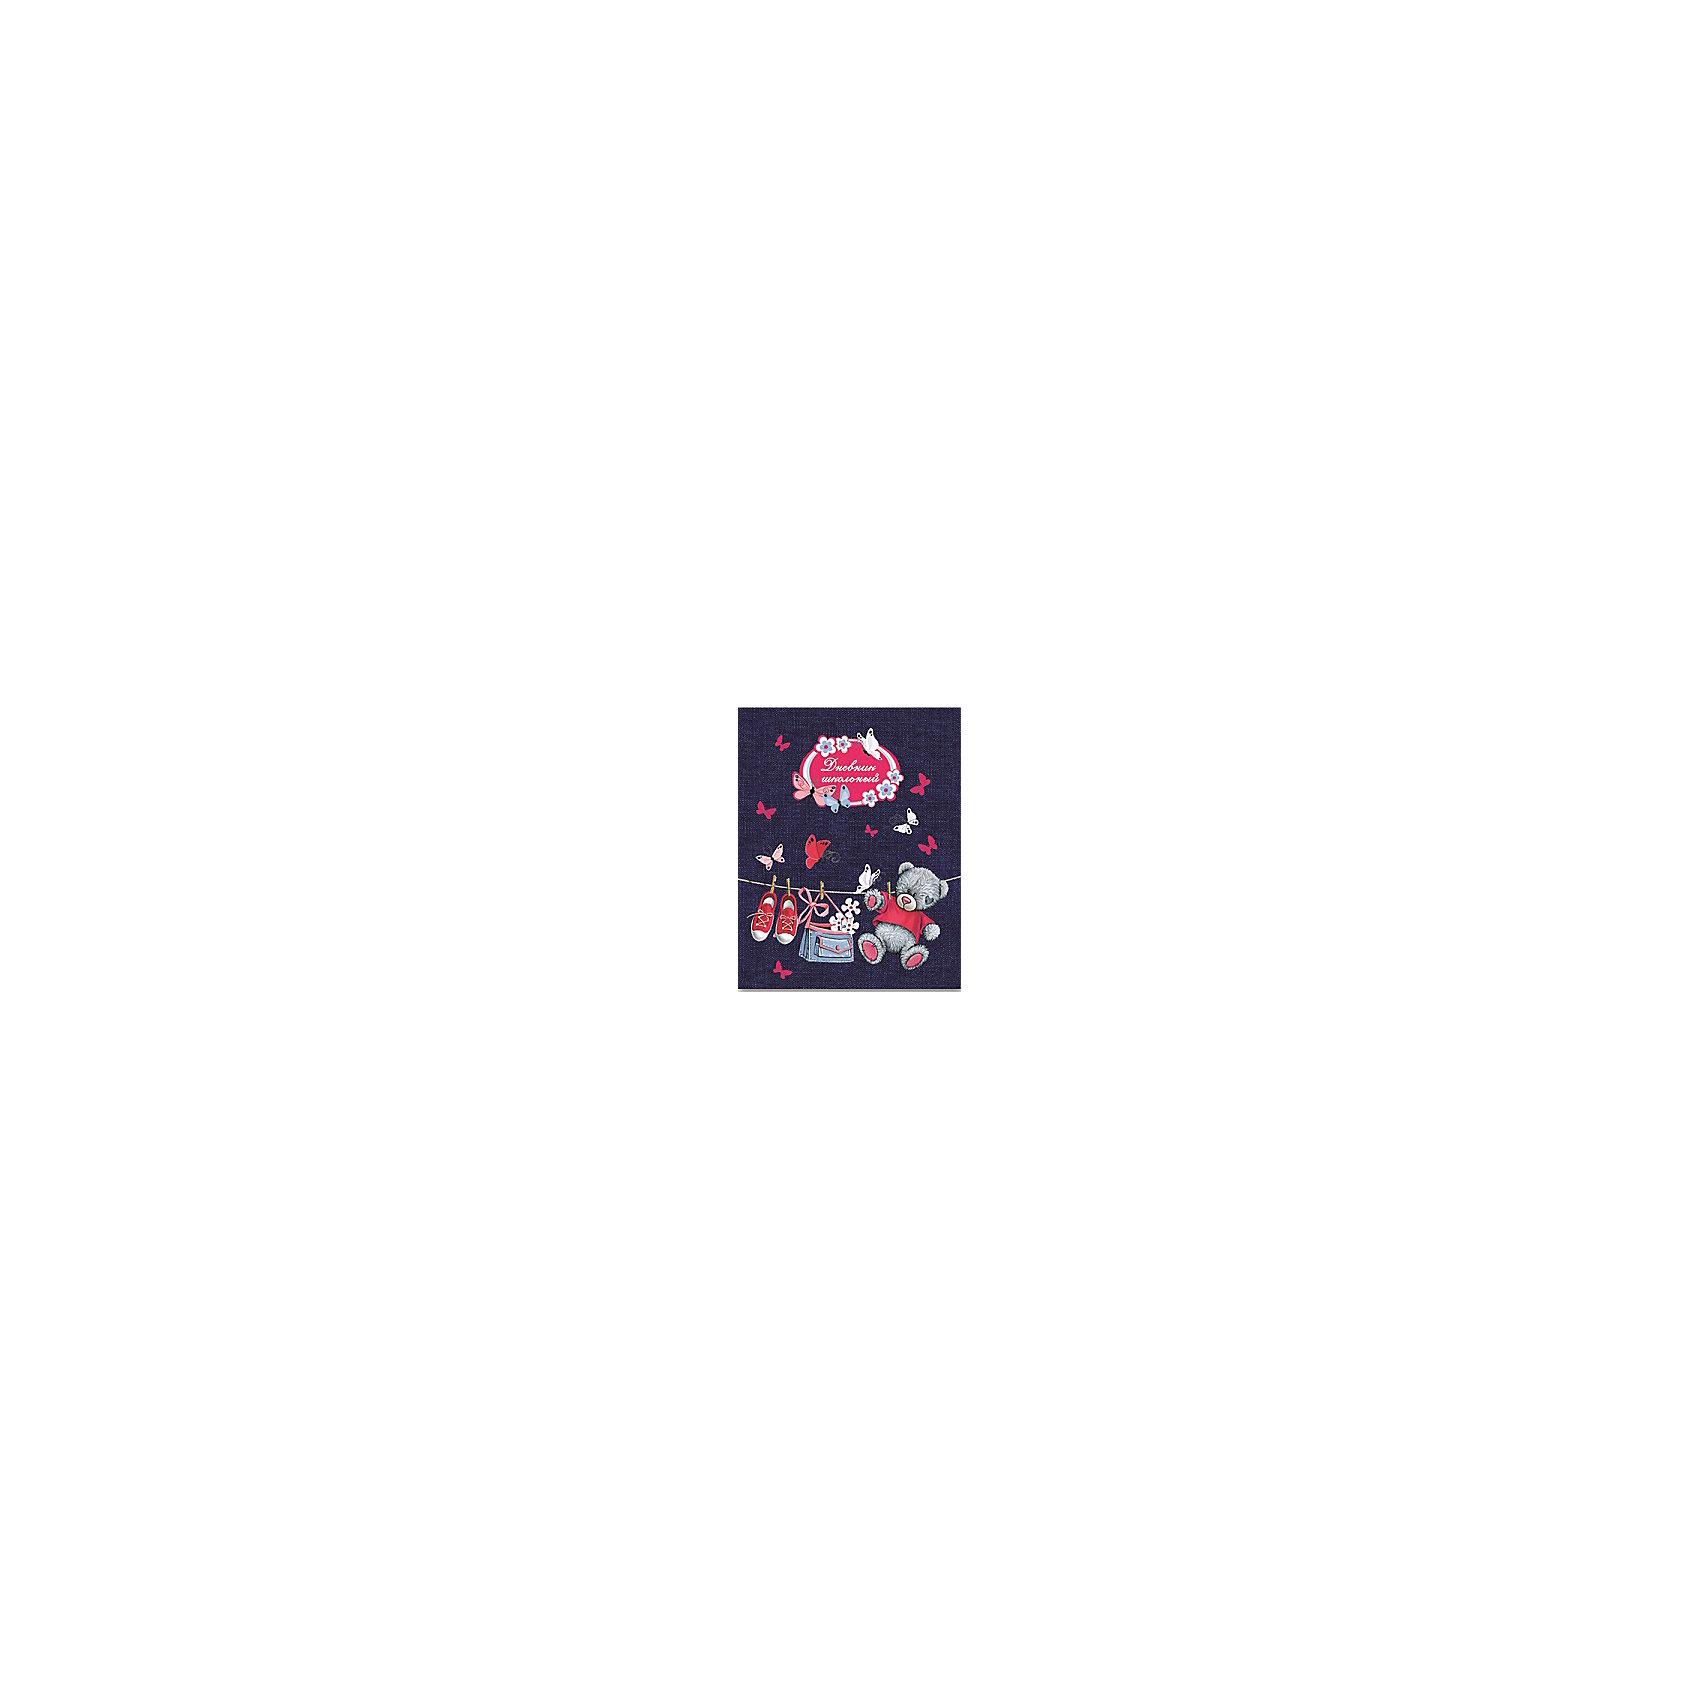 Феникс+ Дневник Мишка на джинсе hsp upgrade steering parts 94103 94123 car r c spare parts 102010 102011 122057 part rc hobby accessories